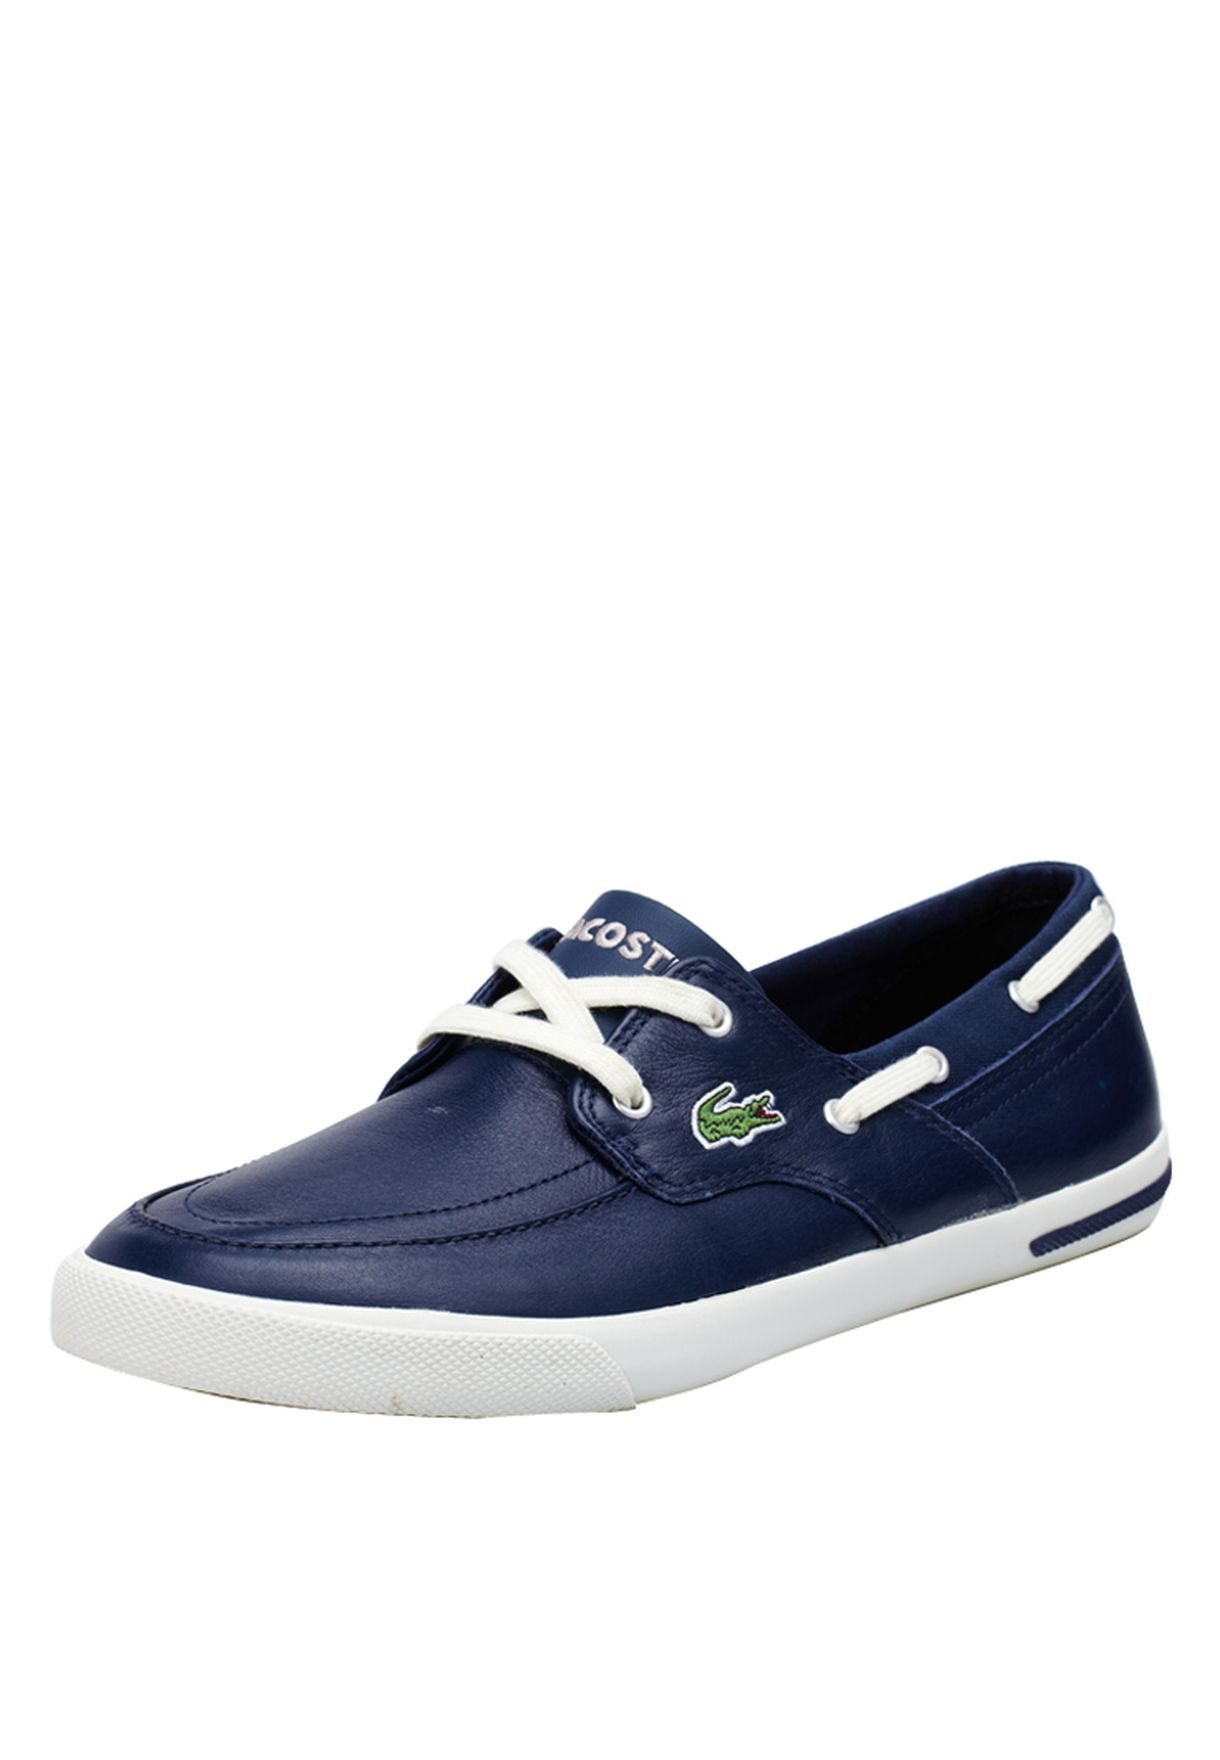 Shop Lacoste blue Newton Boat Boat Shoes 24SPM1238-1W6 for Men in Saudi -  LA014SH69RLA f77d8863ebc